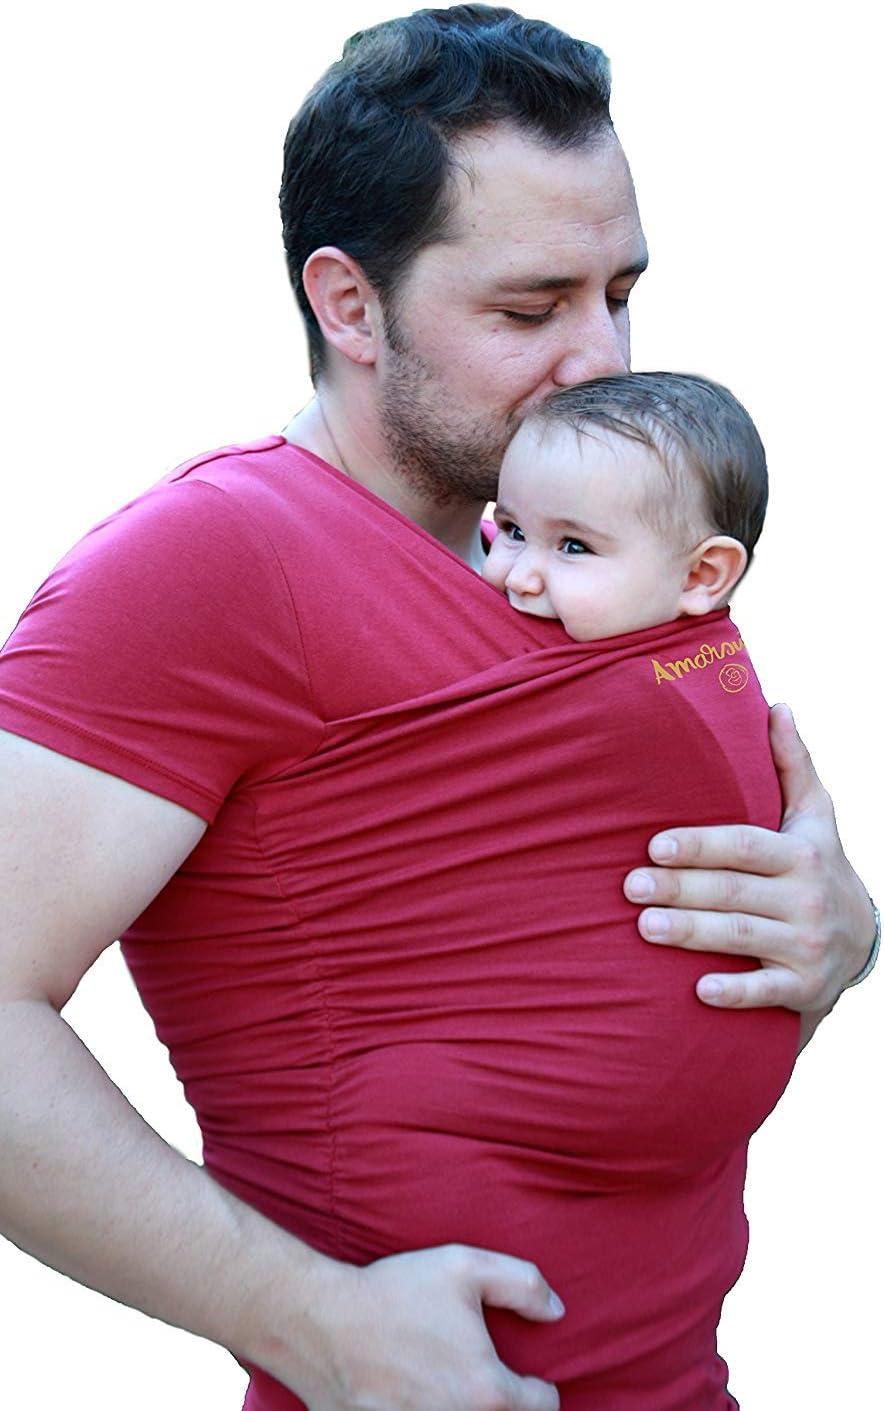 Color gris Antic/ólicos beb/é Hombre Amarsupiel Talla S Camiseta de porteo camiseta portabeb/és 36-38